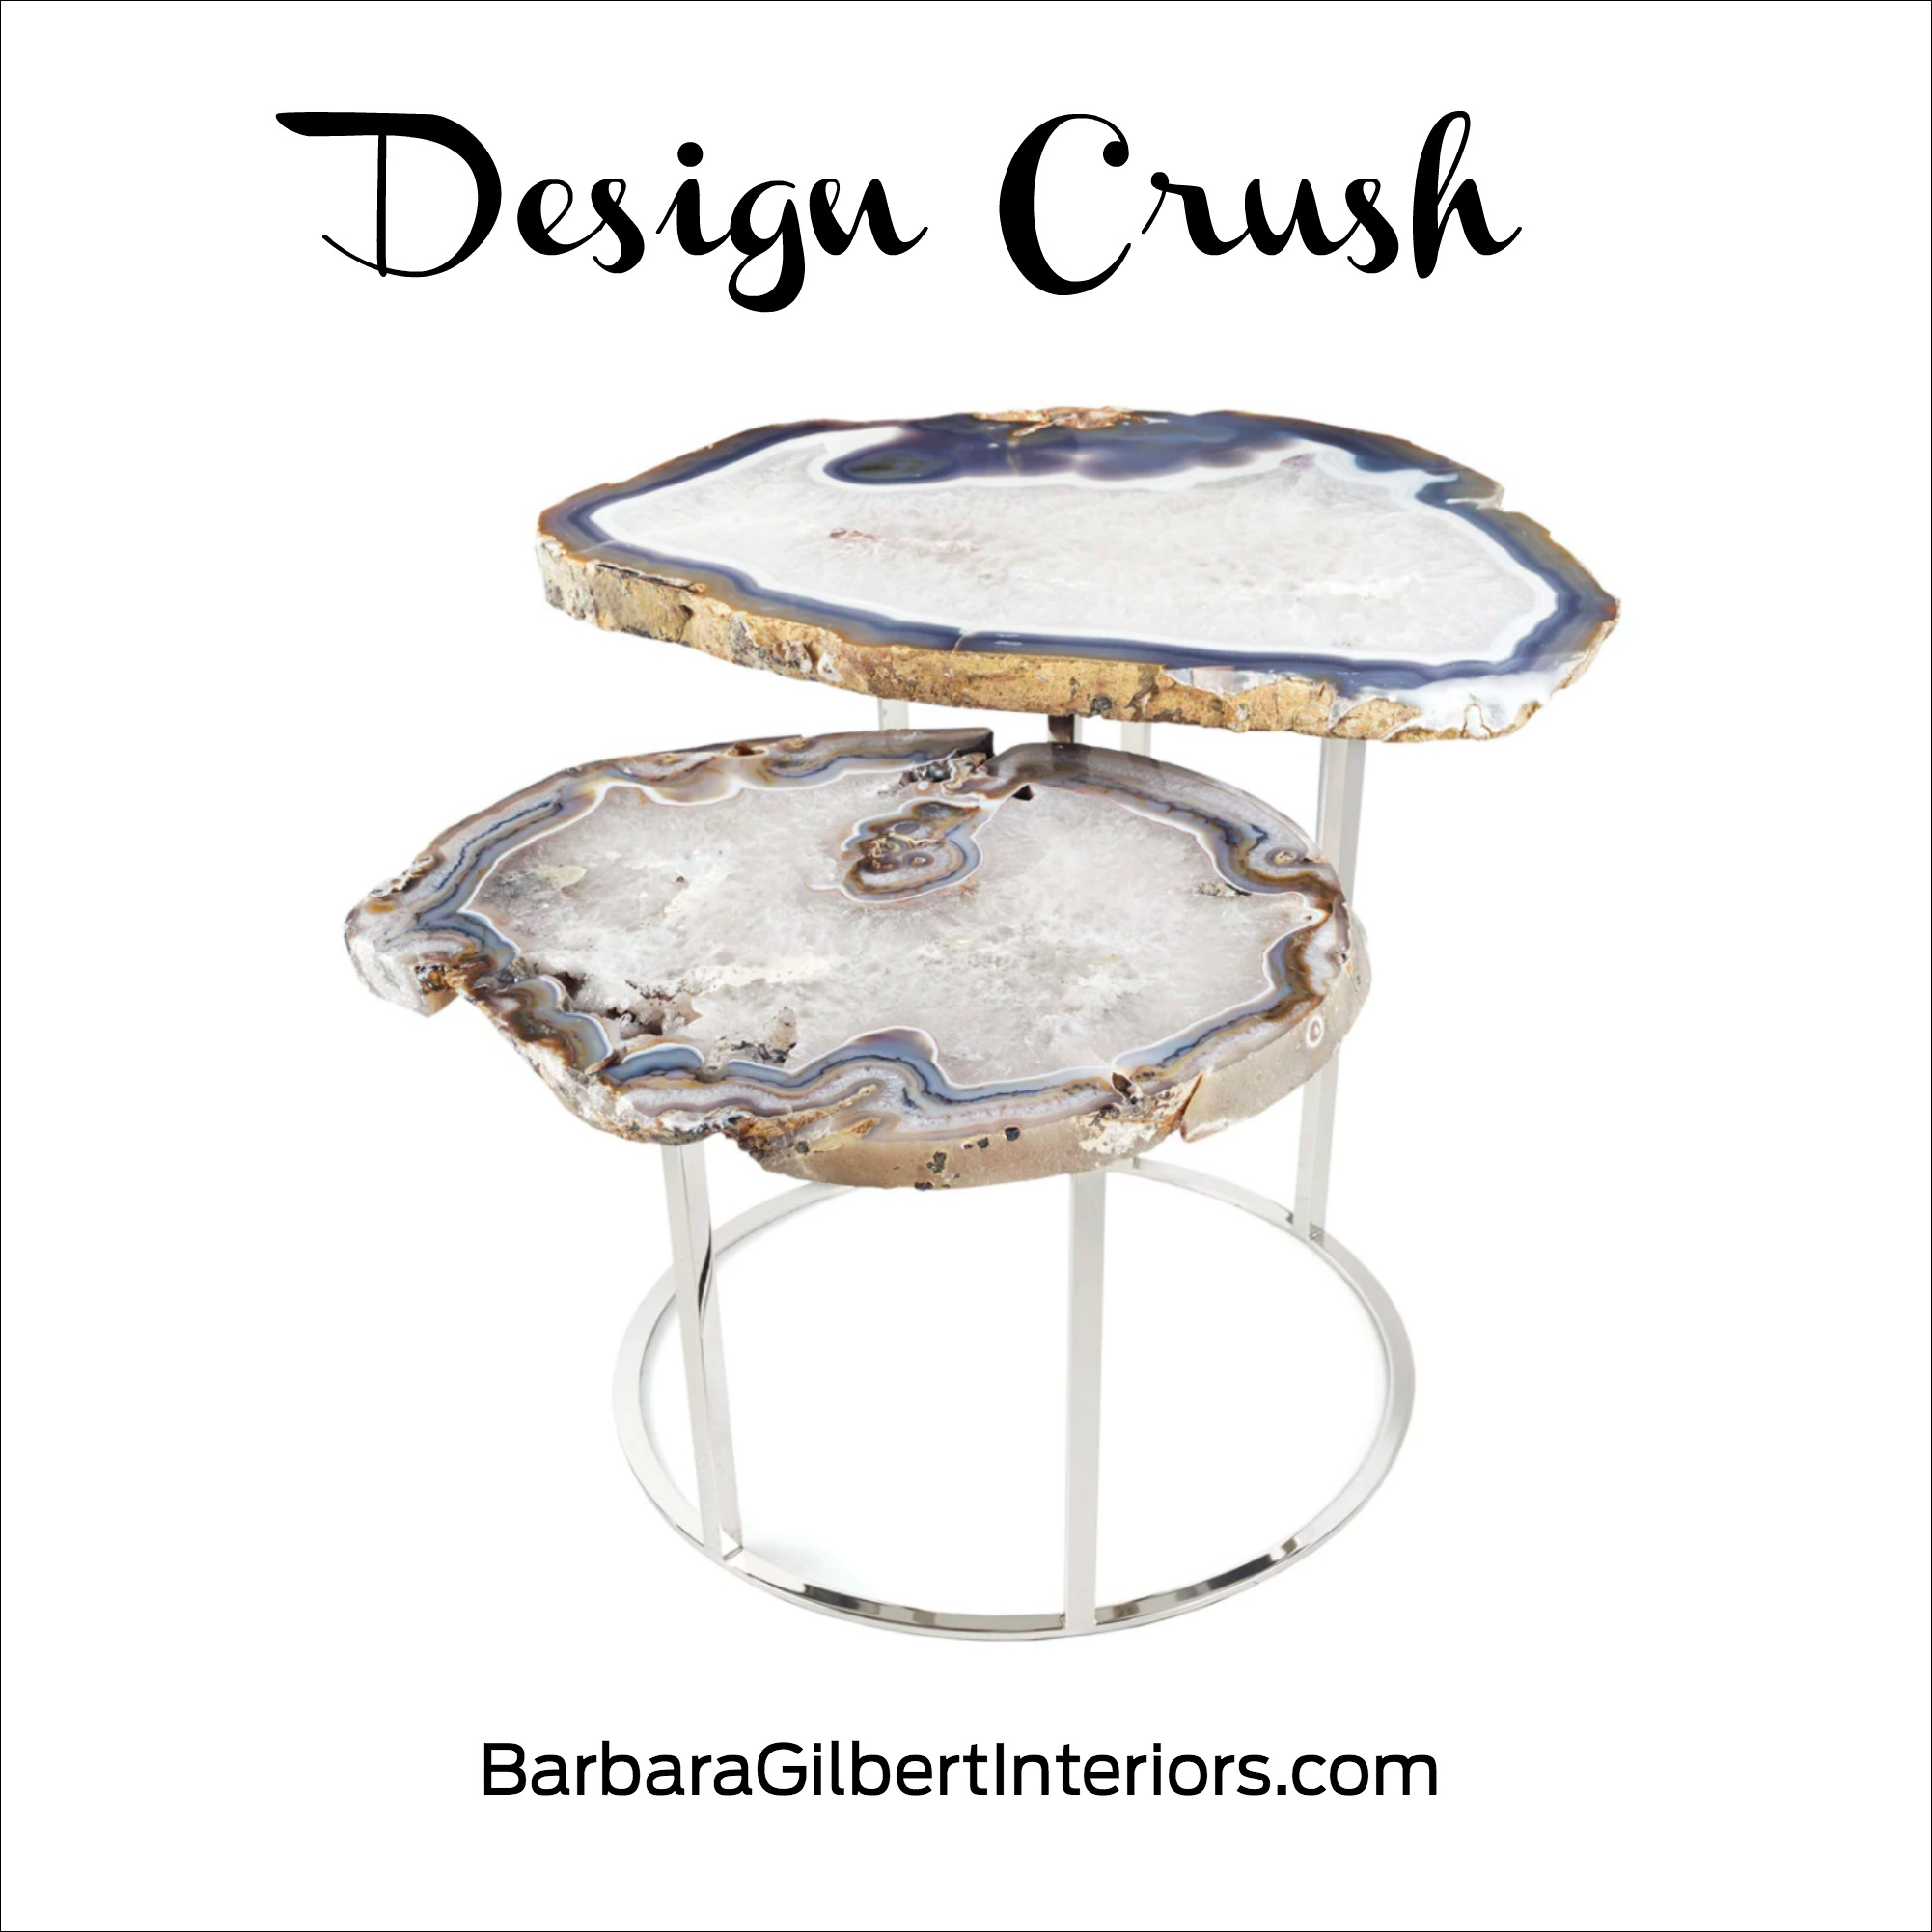 Design Crush: Quinn Agate Coffee Table | Interior Design Dallas | Barbara Gilbert Interiors